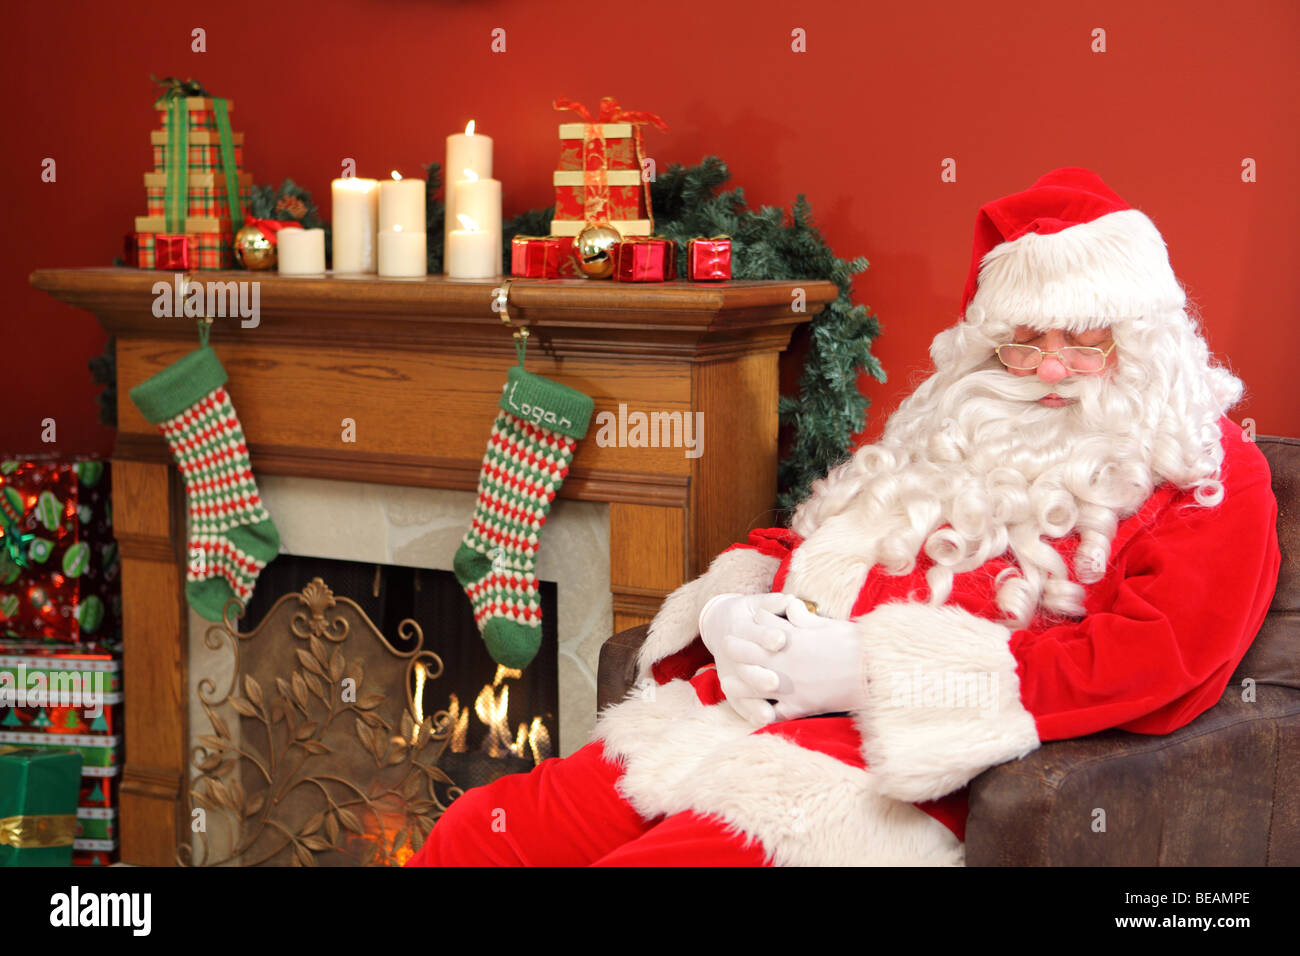 Santa Claus sleeping in chair - Stock Image